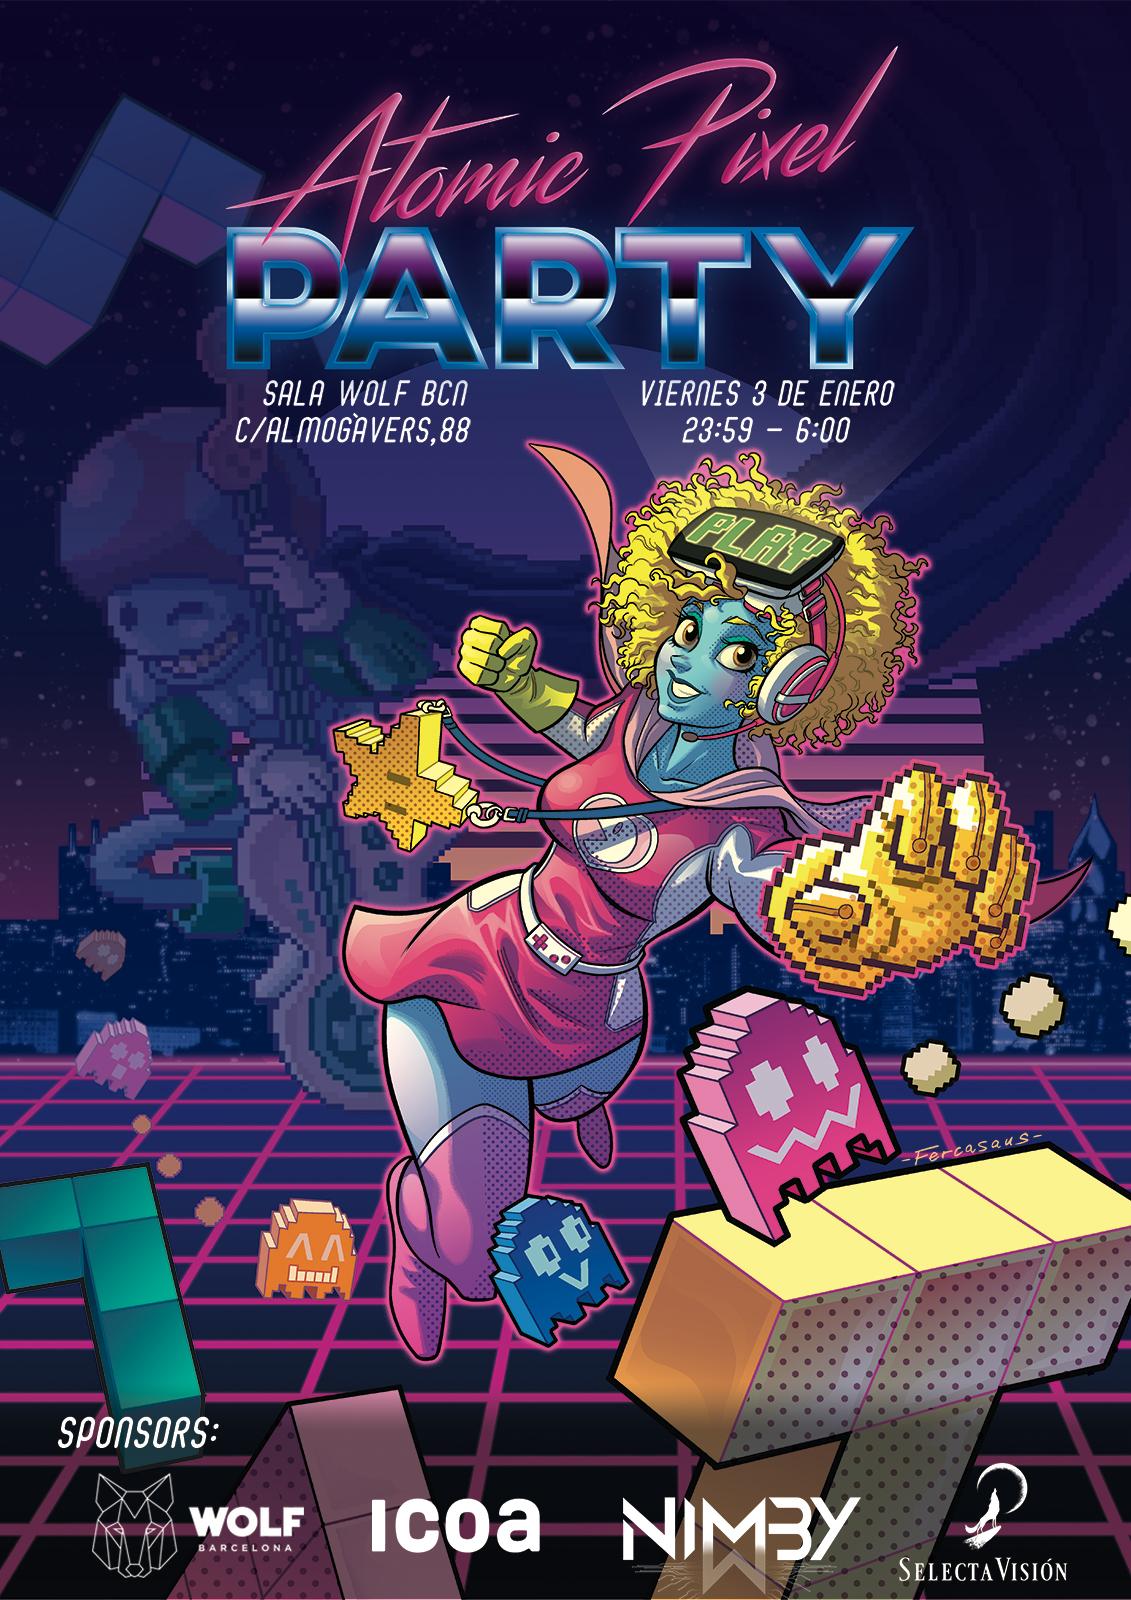 Cartel de la Atomic Pixel Party Barcelona